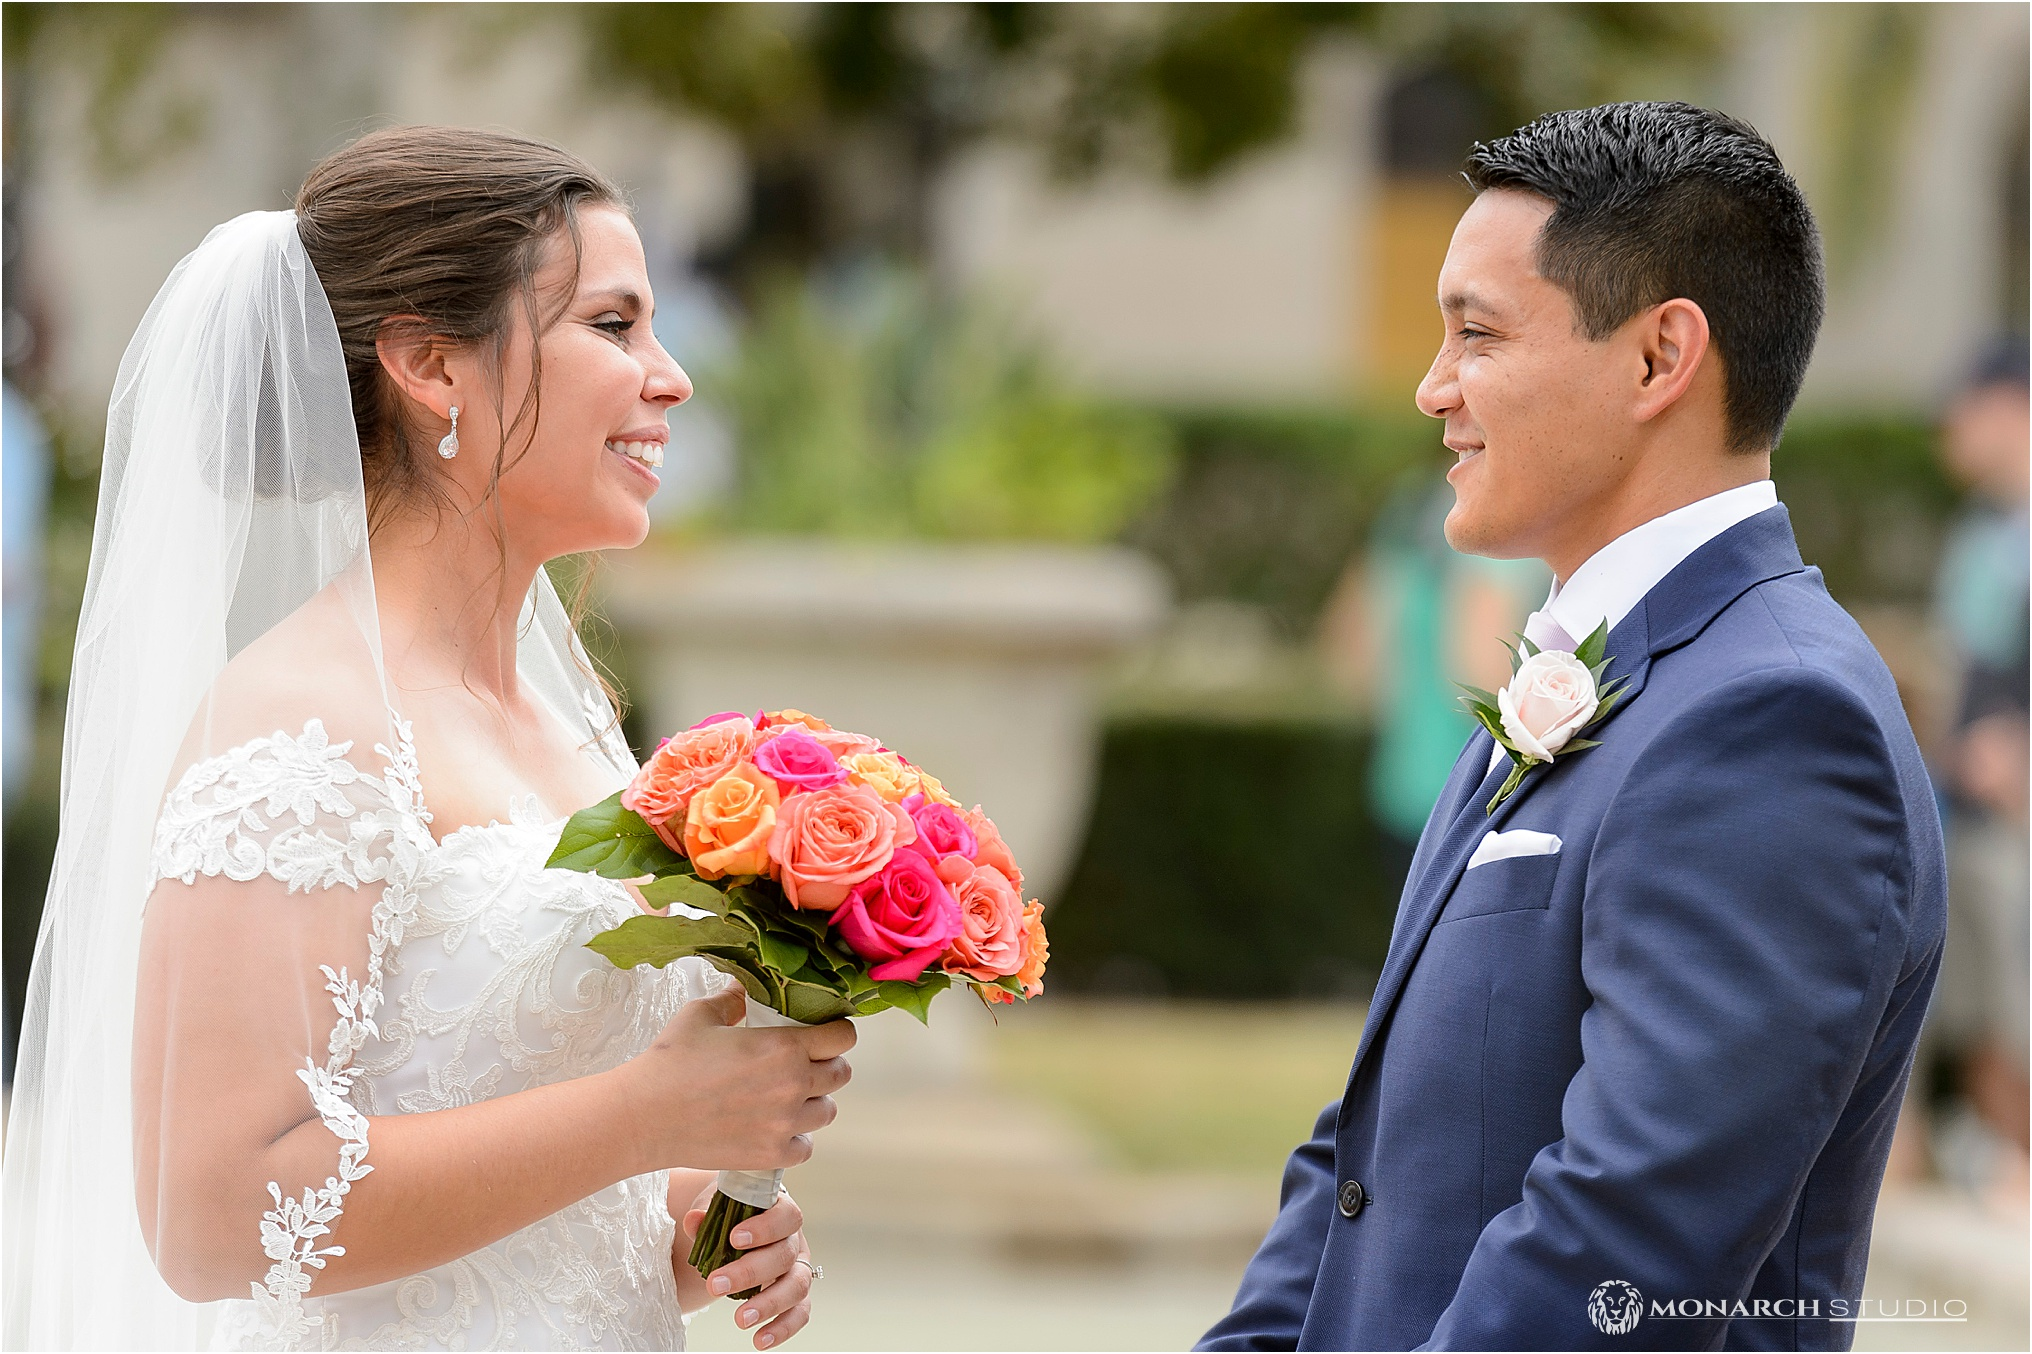 st-augustine-catholic-wedding-021.jpg